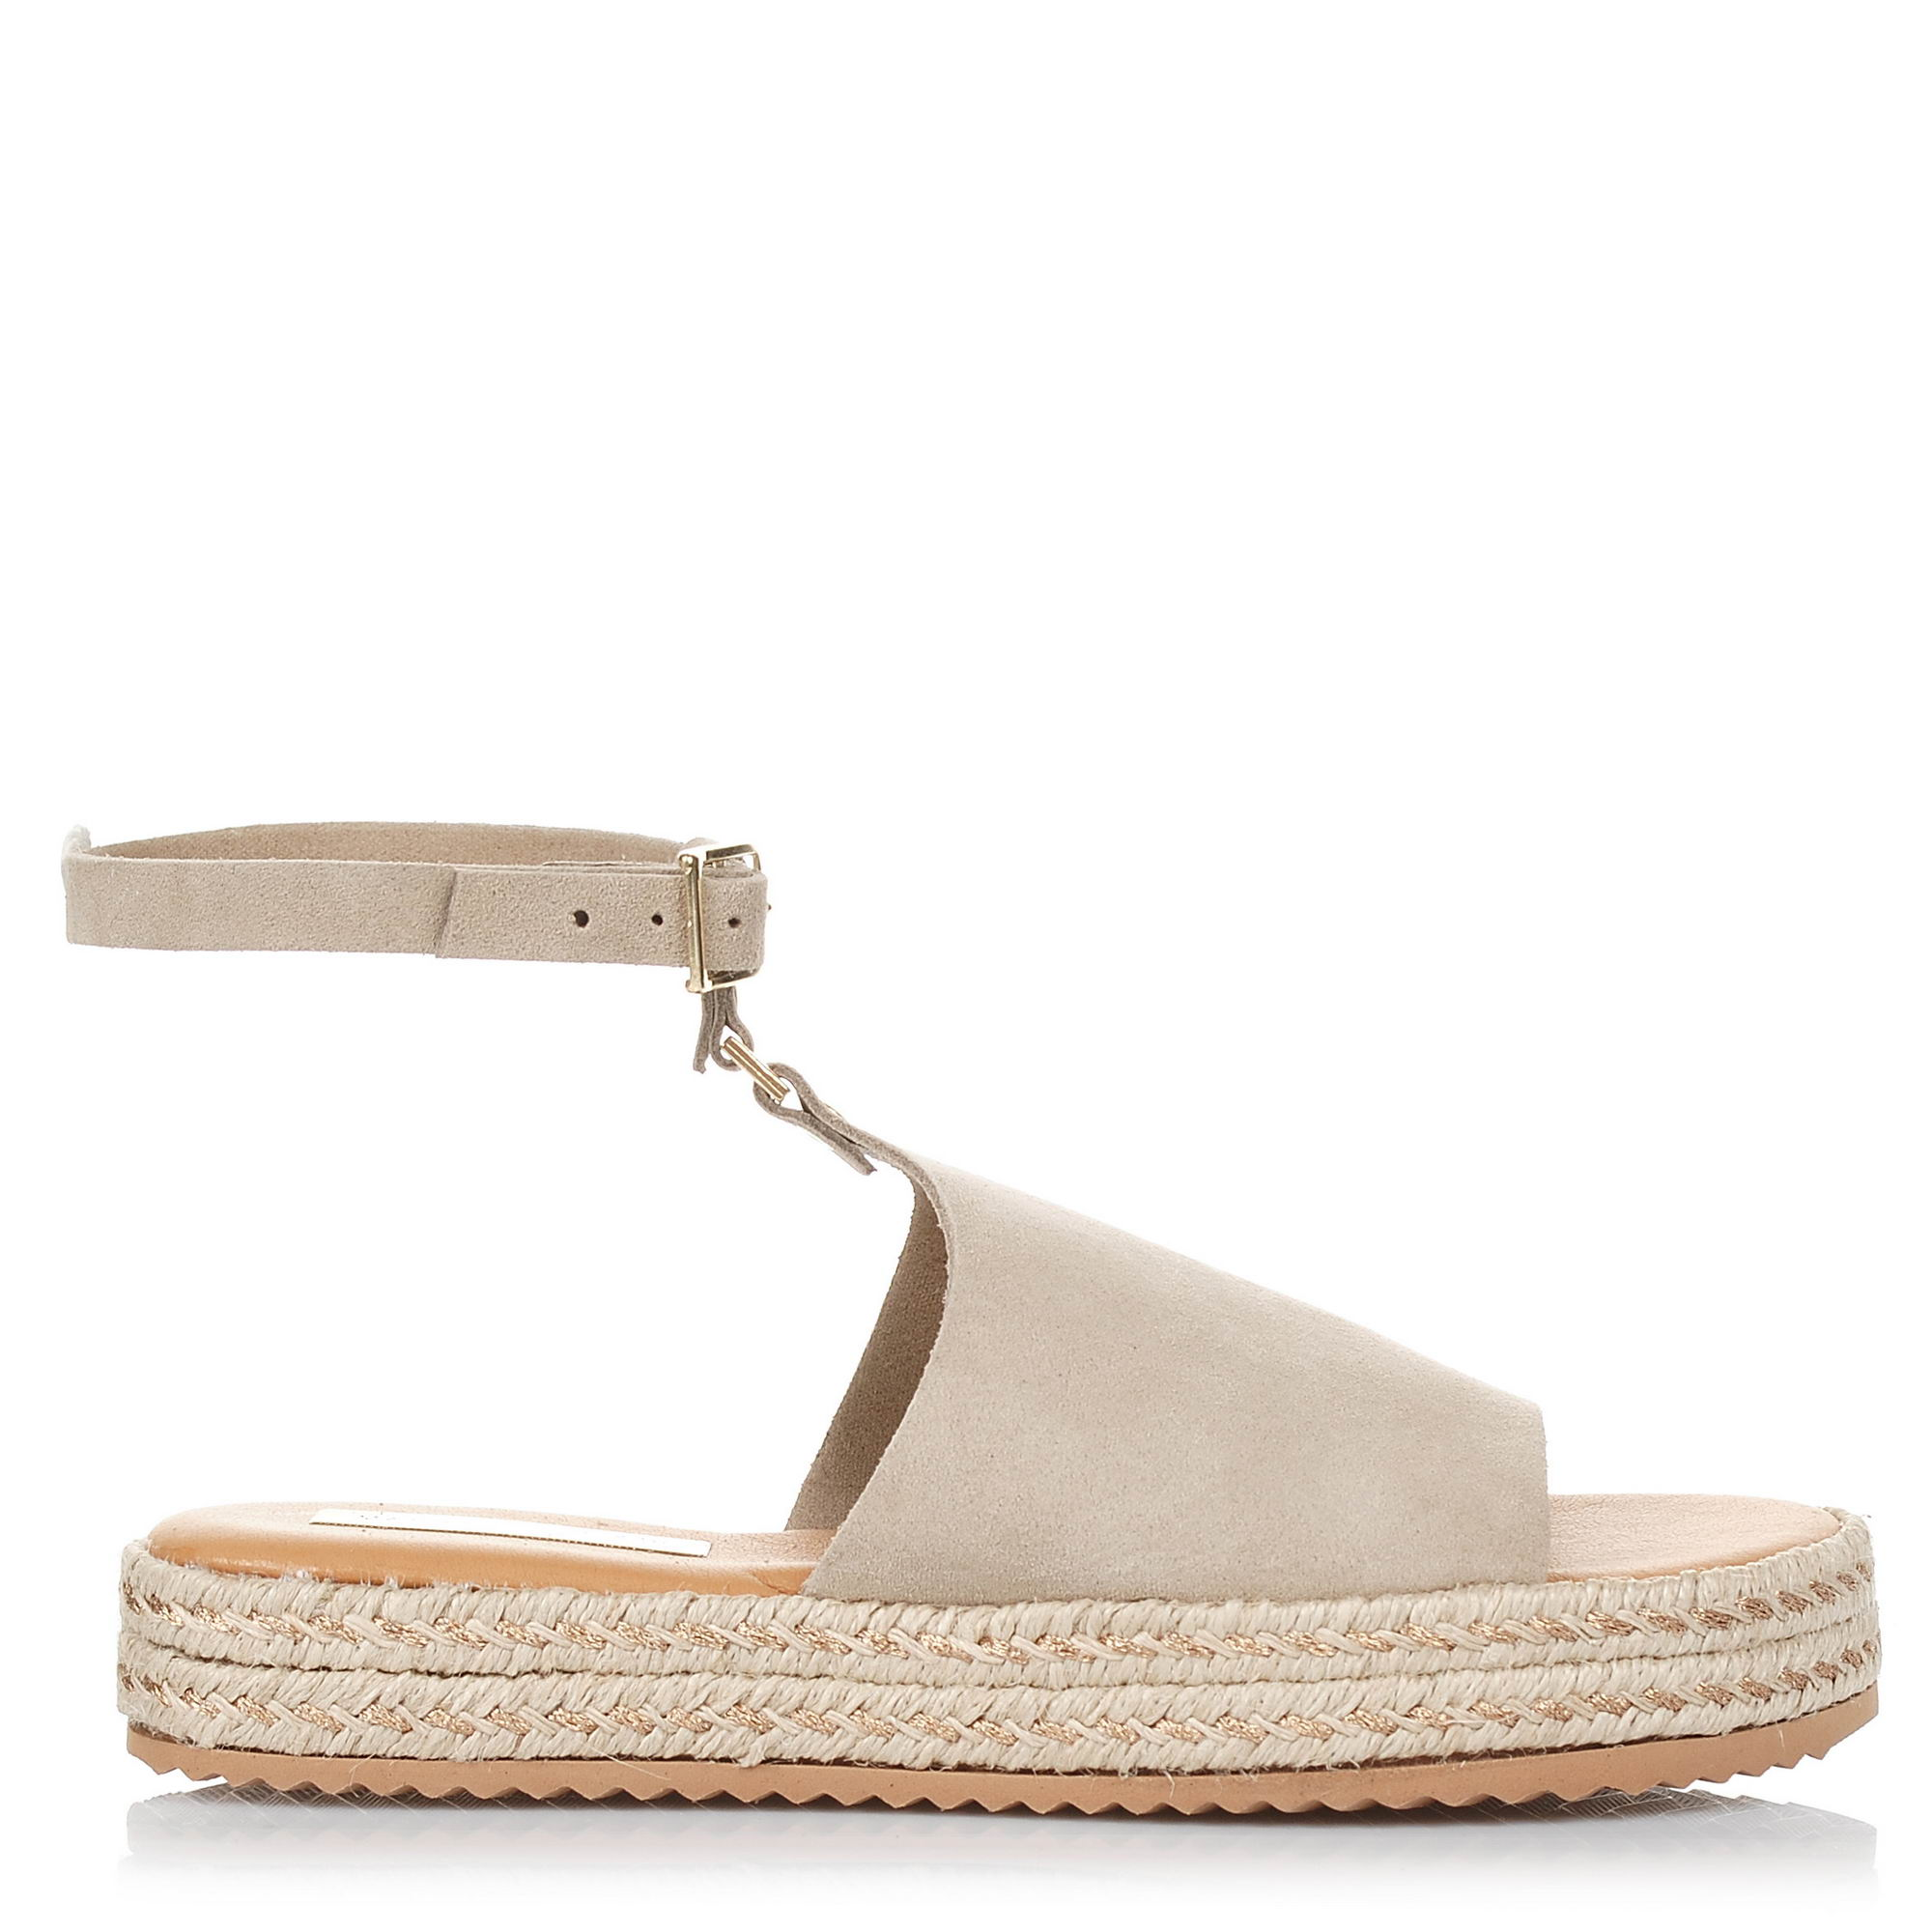 Suede Δερμάτινες Εσπαντρίγιες-Πέδιλα Mariella Fabiani Tsel 2030 γυναικα   γυναικείο παπούτσι